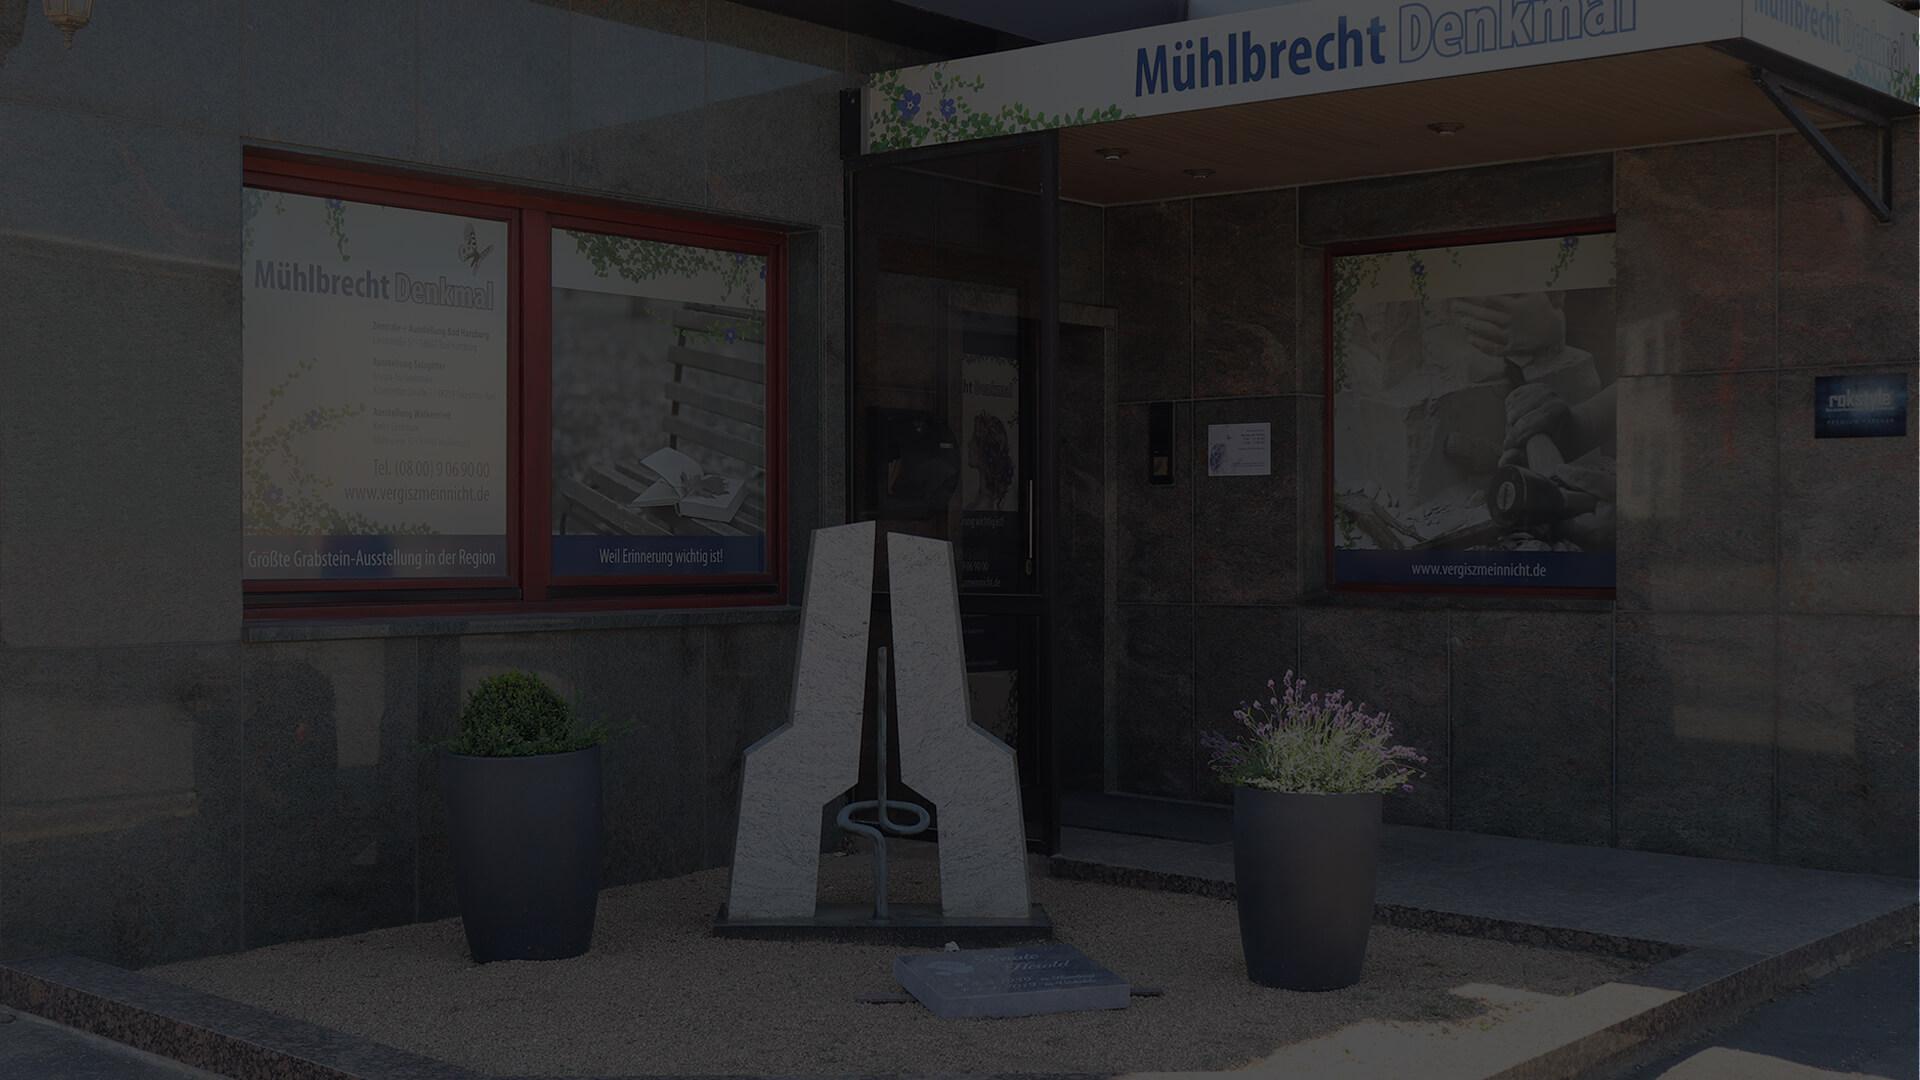 muehlbrecht-grabmale-slidshow-3